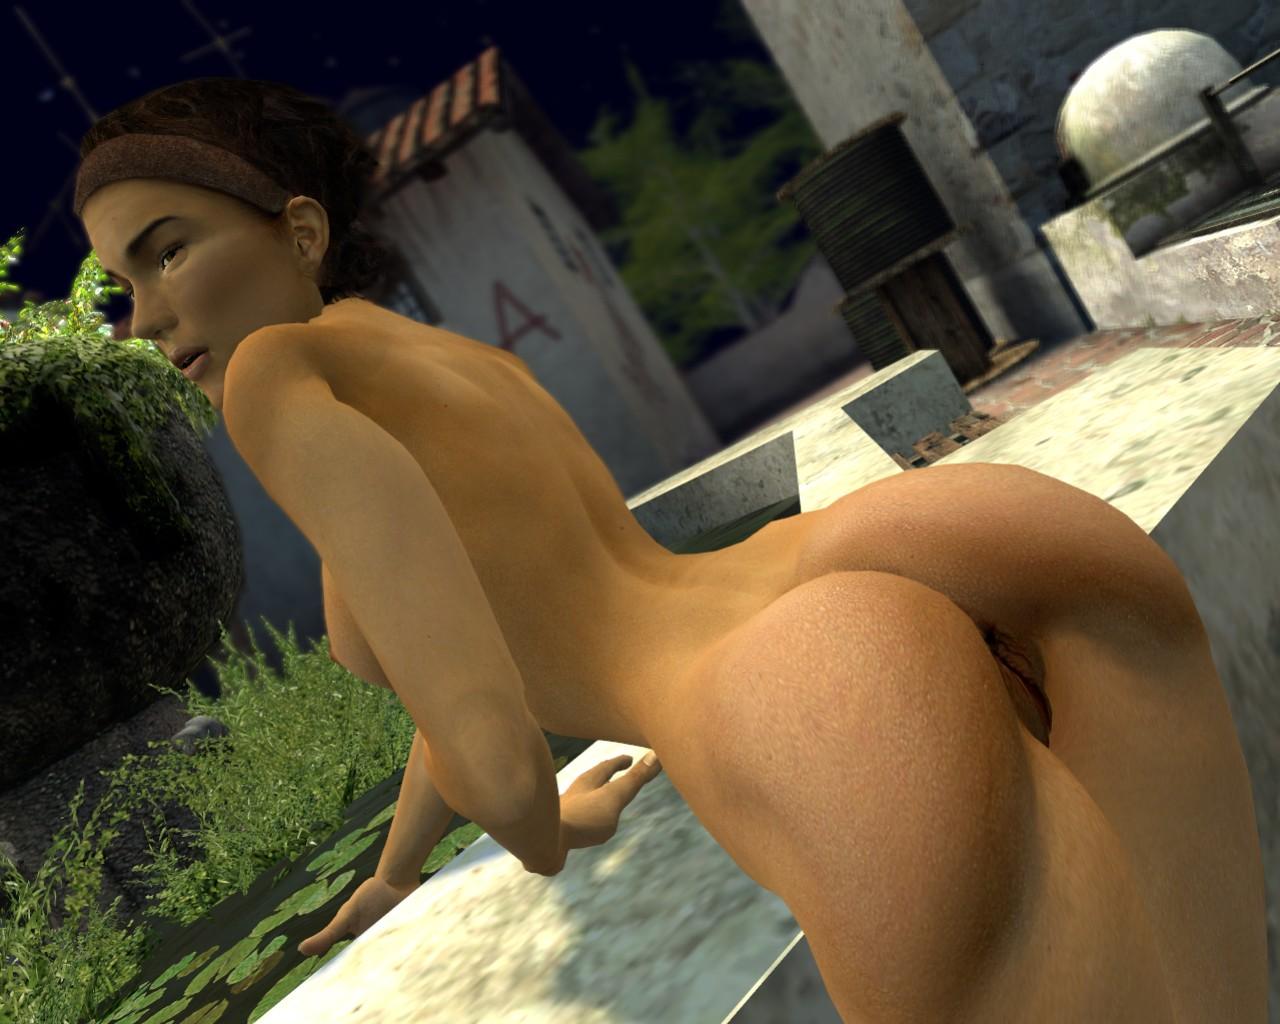 naked-mossman-penetration-movie